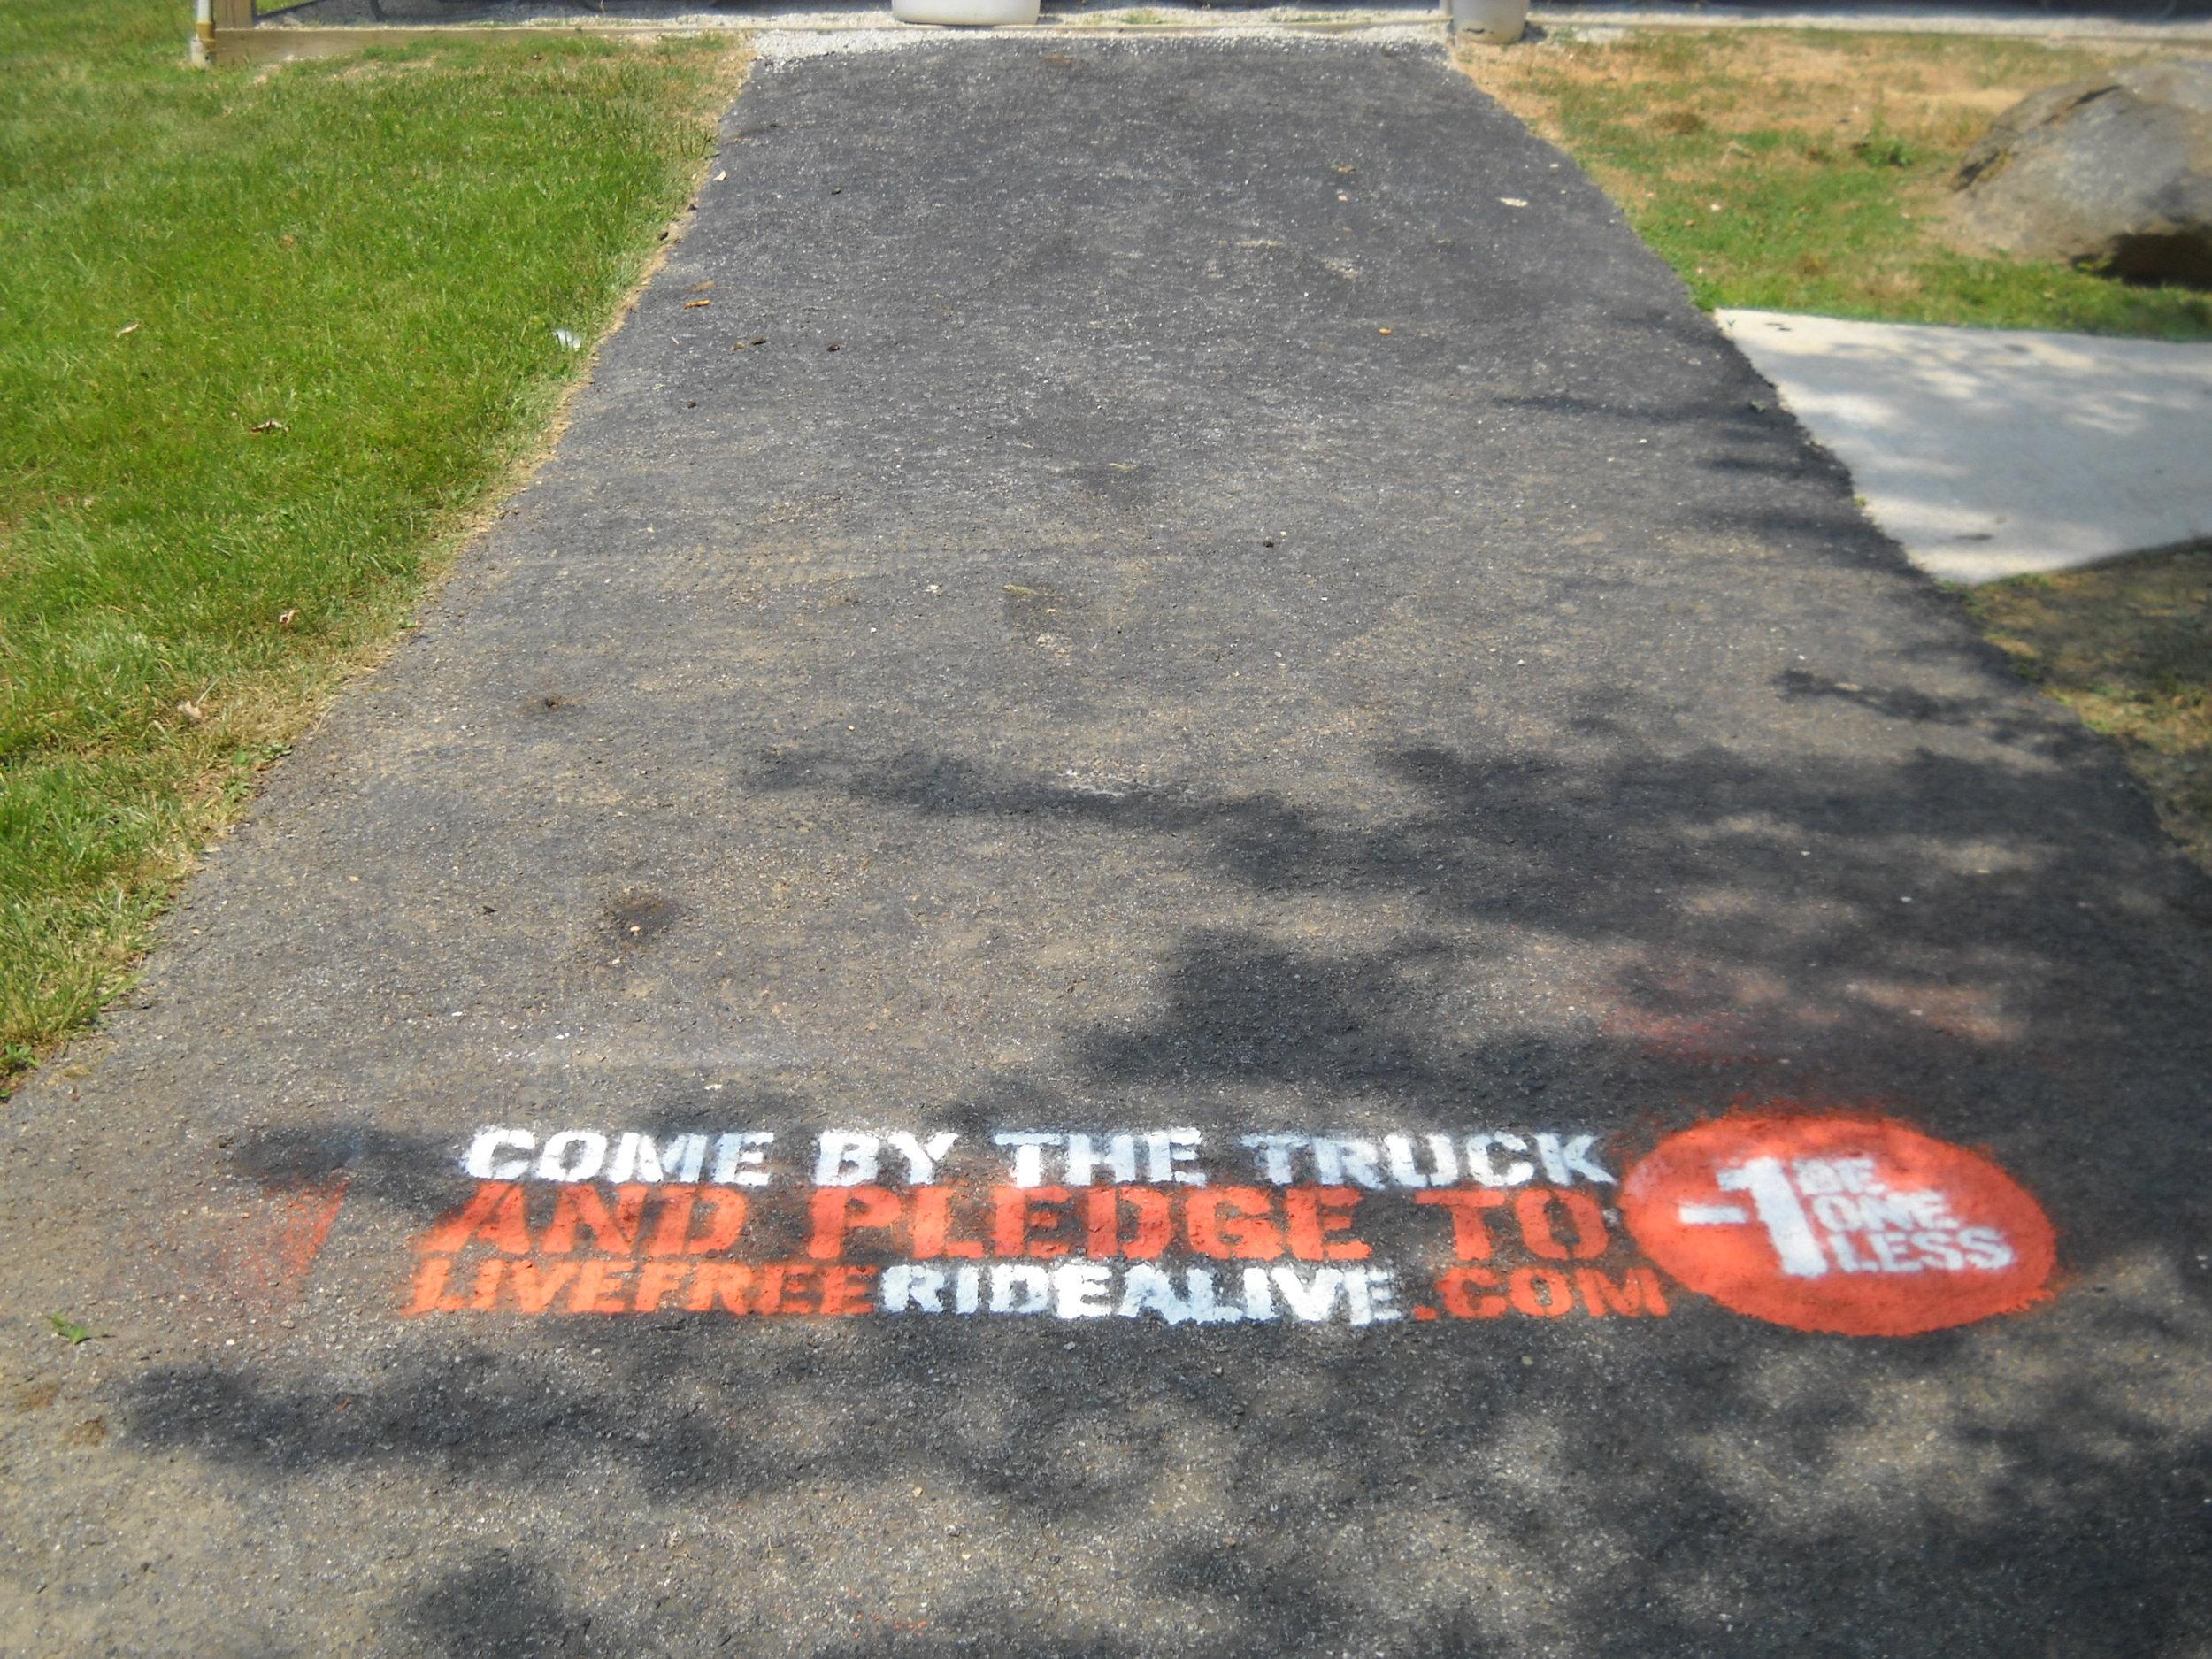 Side walk chalks gettysburg pa (1).JPG